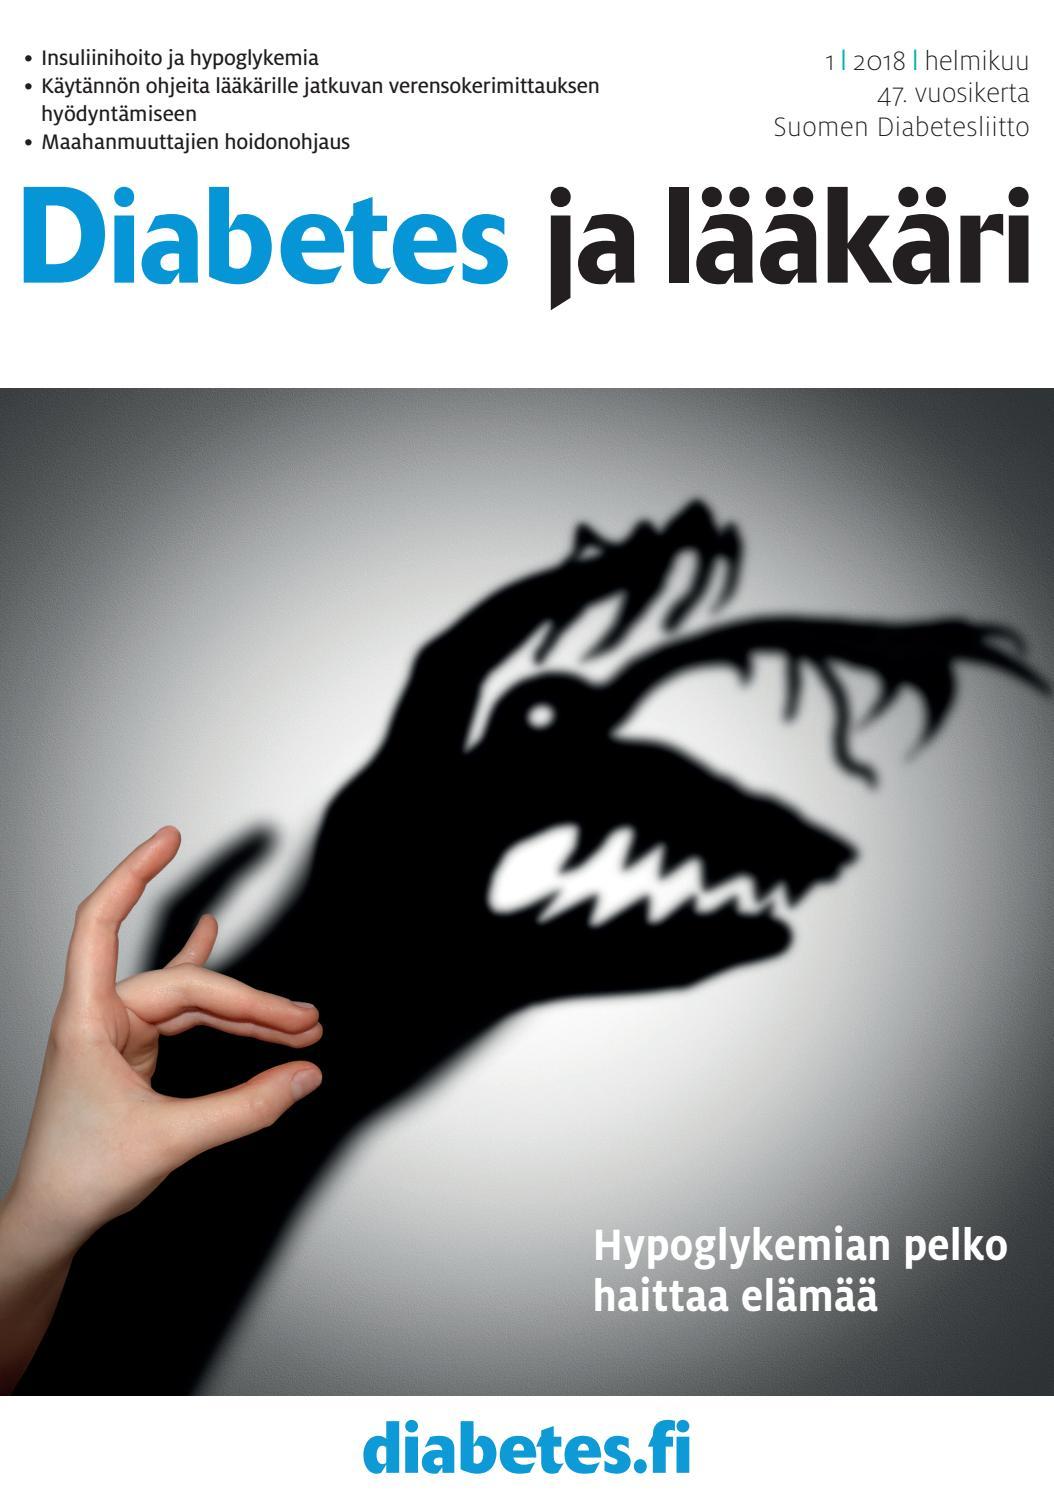 diabetesliitto turku